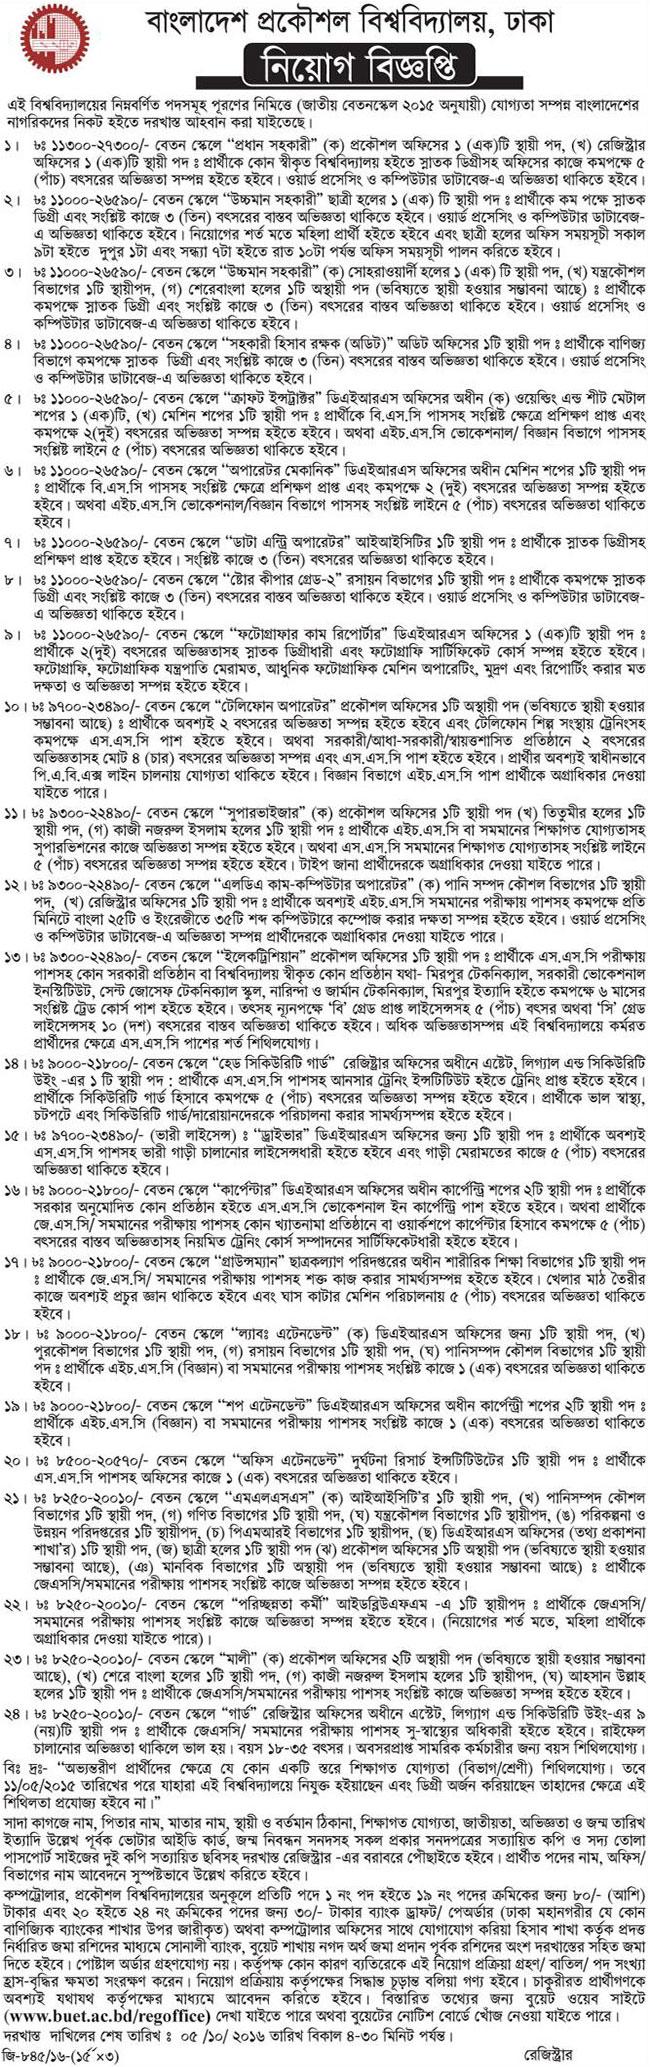 Bangladesh Engineering University Job Circular  Job Circular